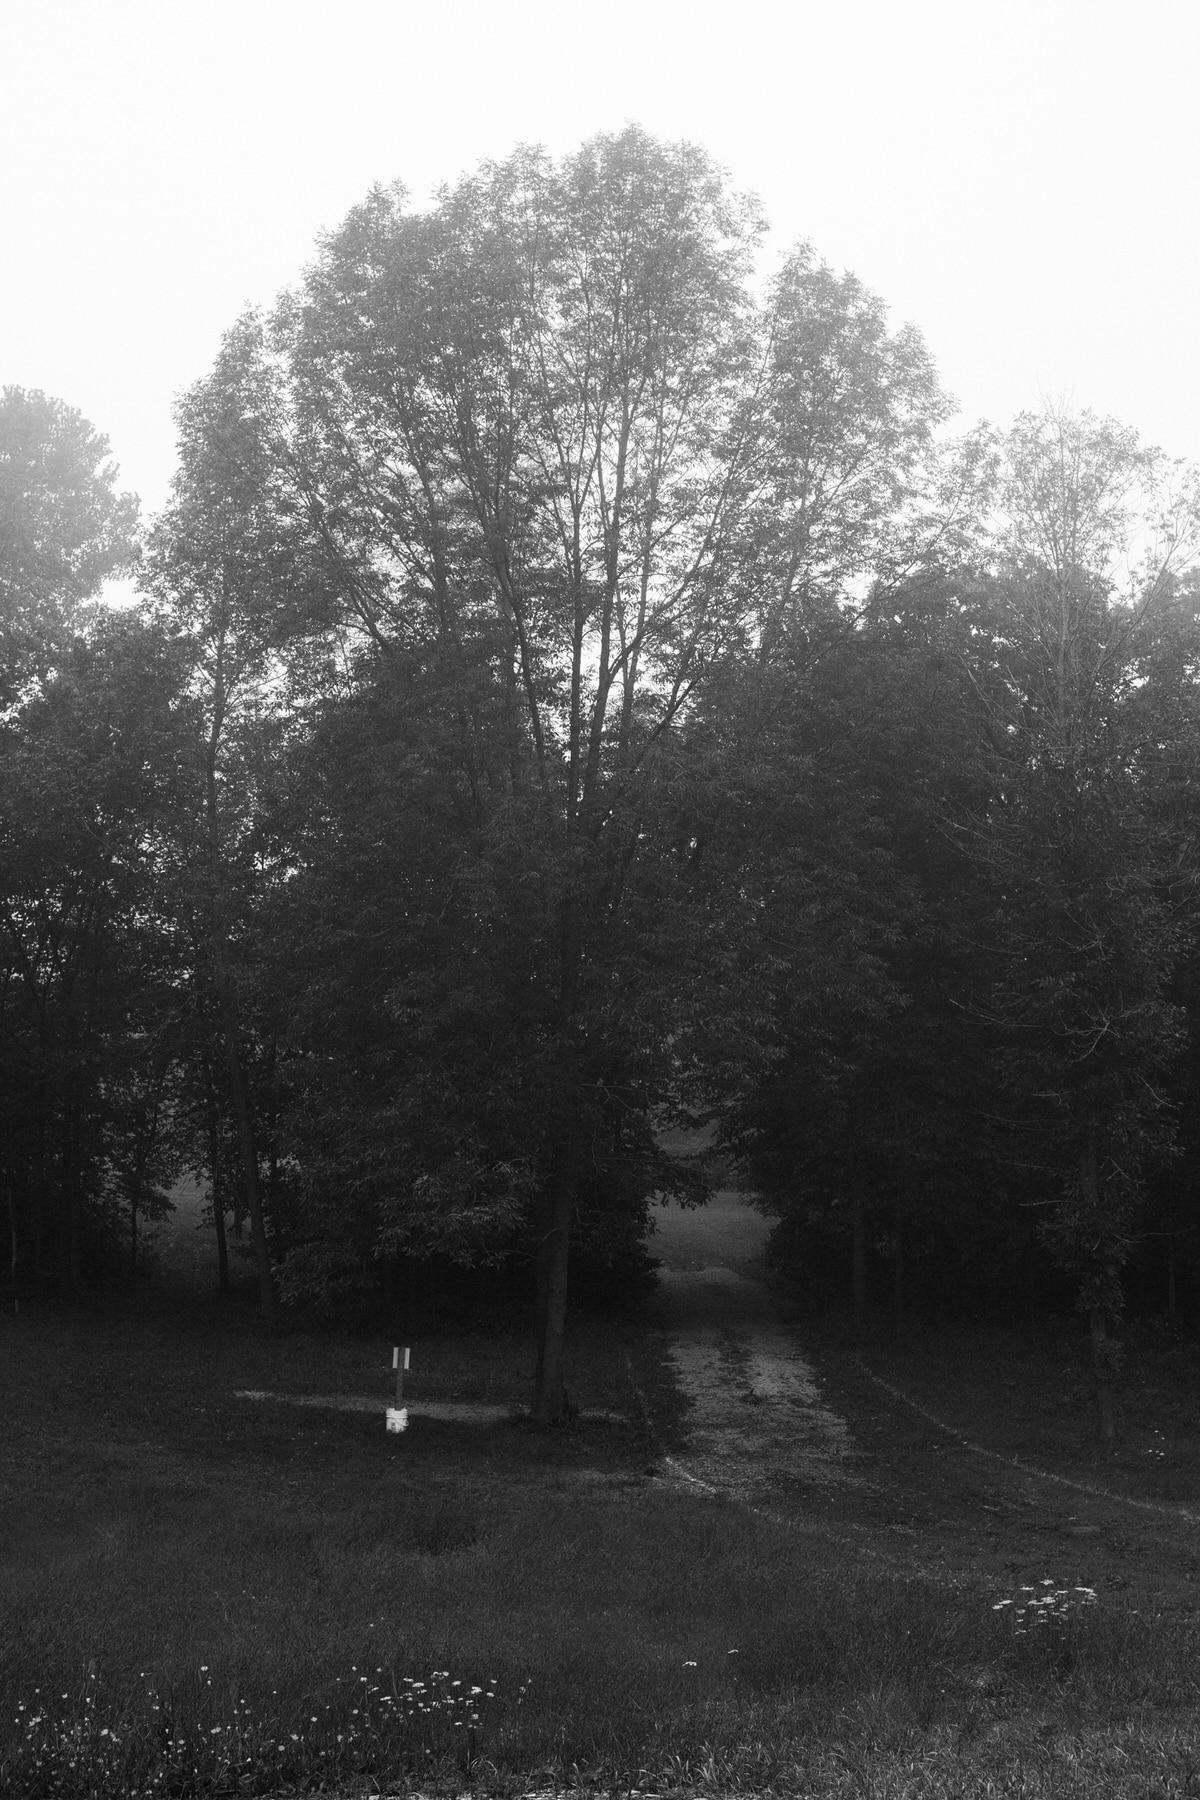 Kiekhaefer-Park-Fond-du-Lac-Wisconsin-black-and-white-fine-art-photography-by-Studio-L-photographer-Laura-Schneider-_3482